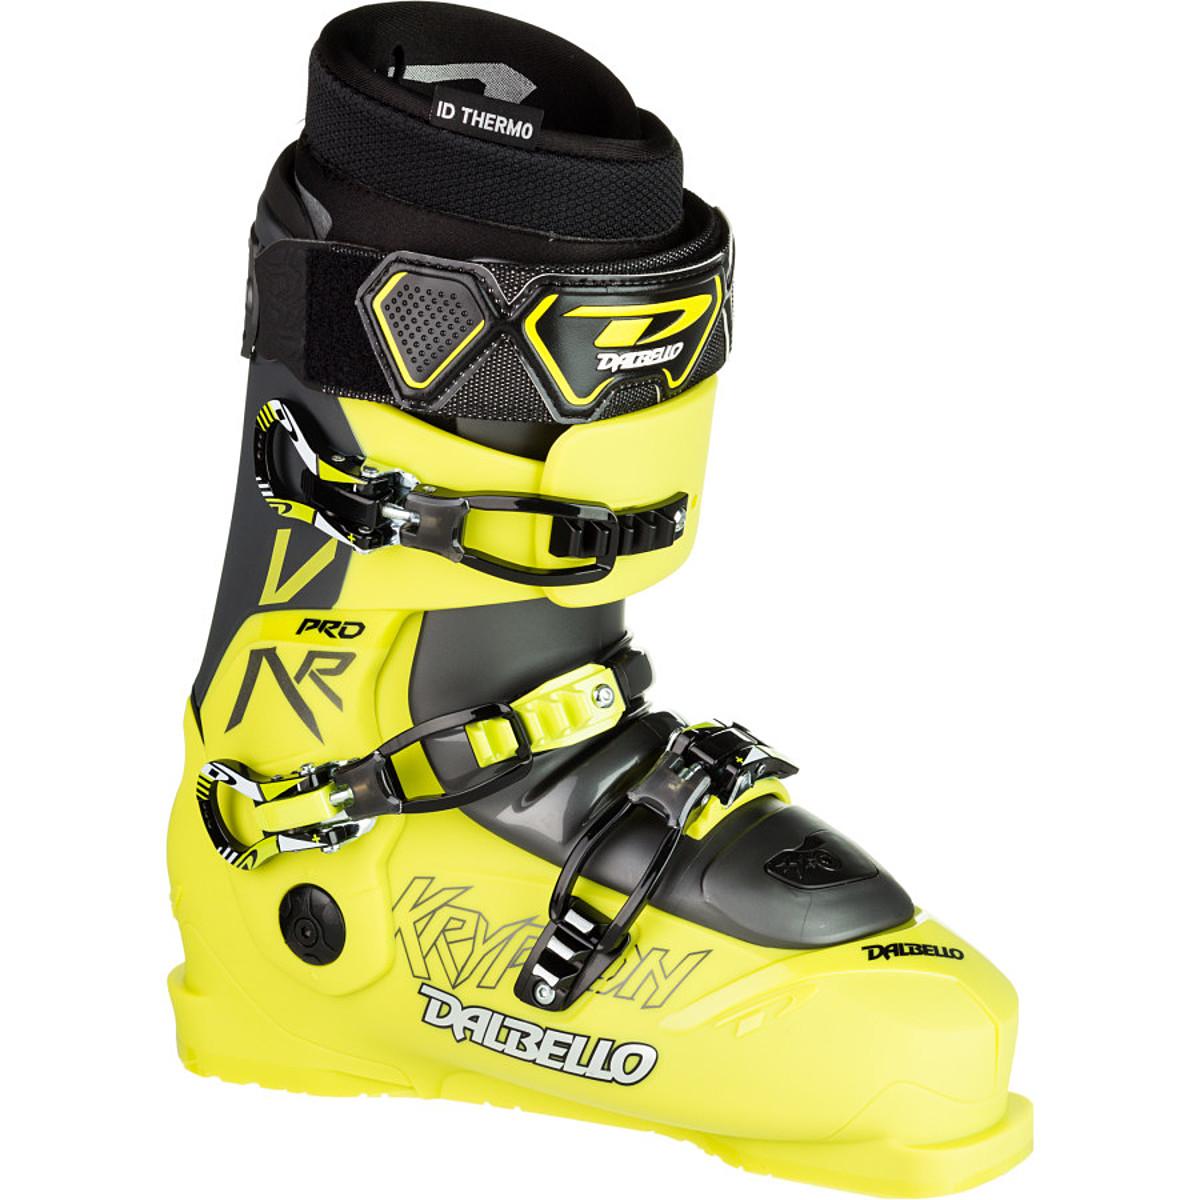 Dalbello Krypton KR 2 Pro Boot